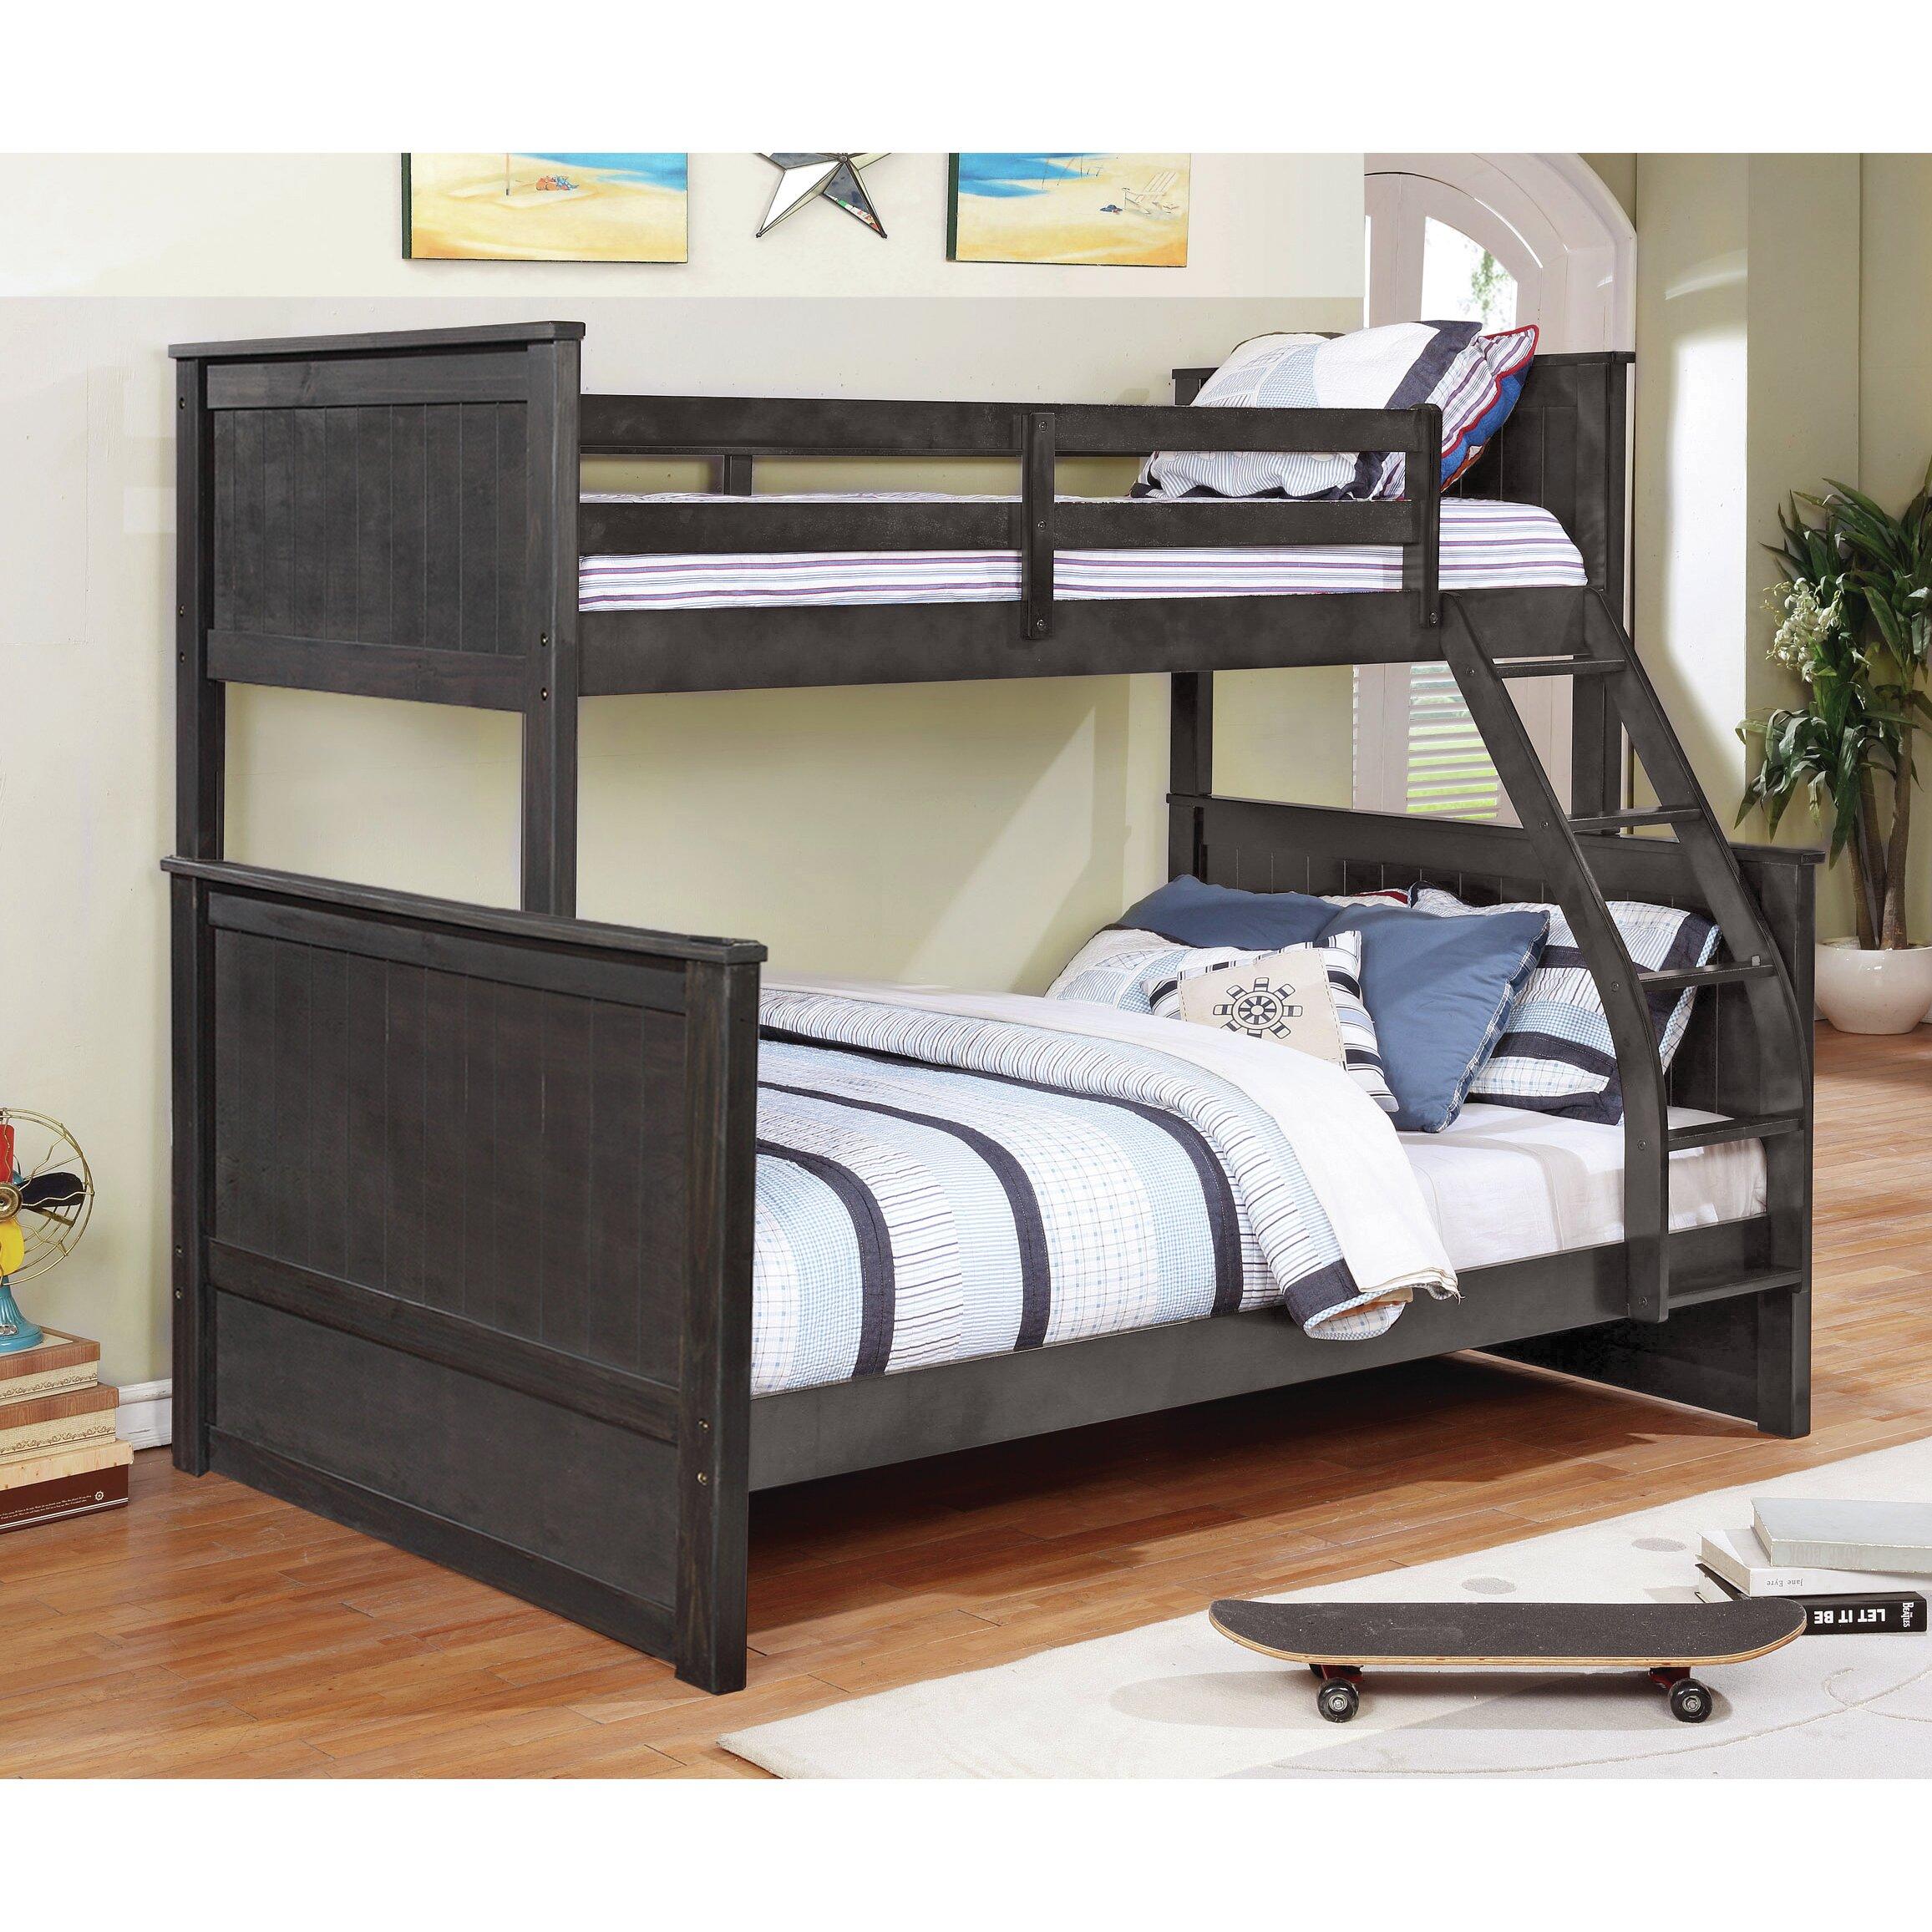 Magnolia Home Hudson Twin Over Full Loft Bunk Bed Reviews Wayfair